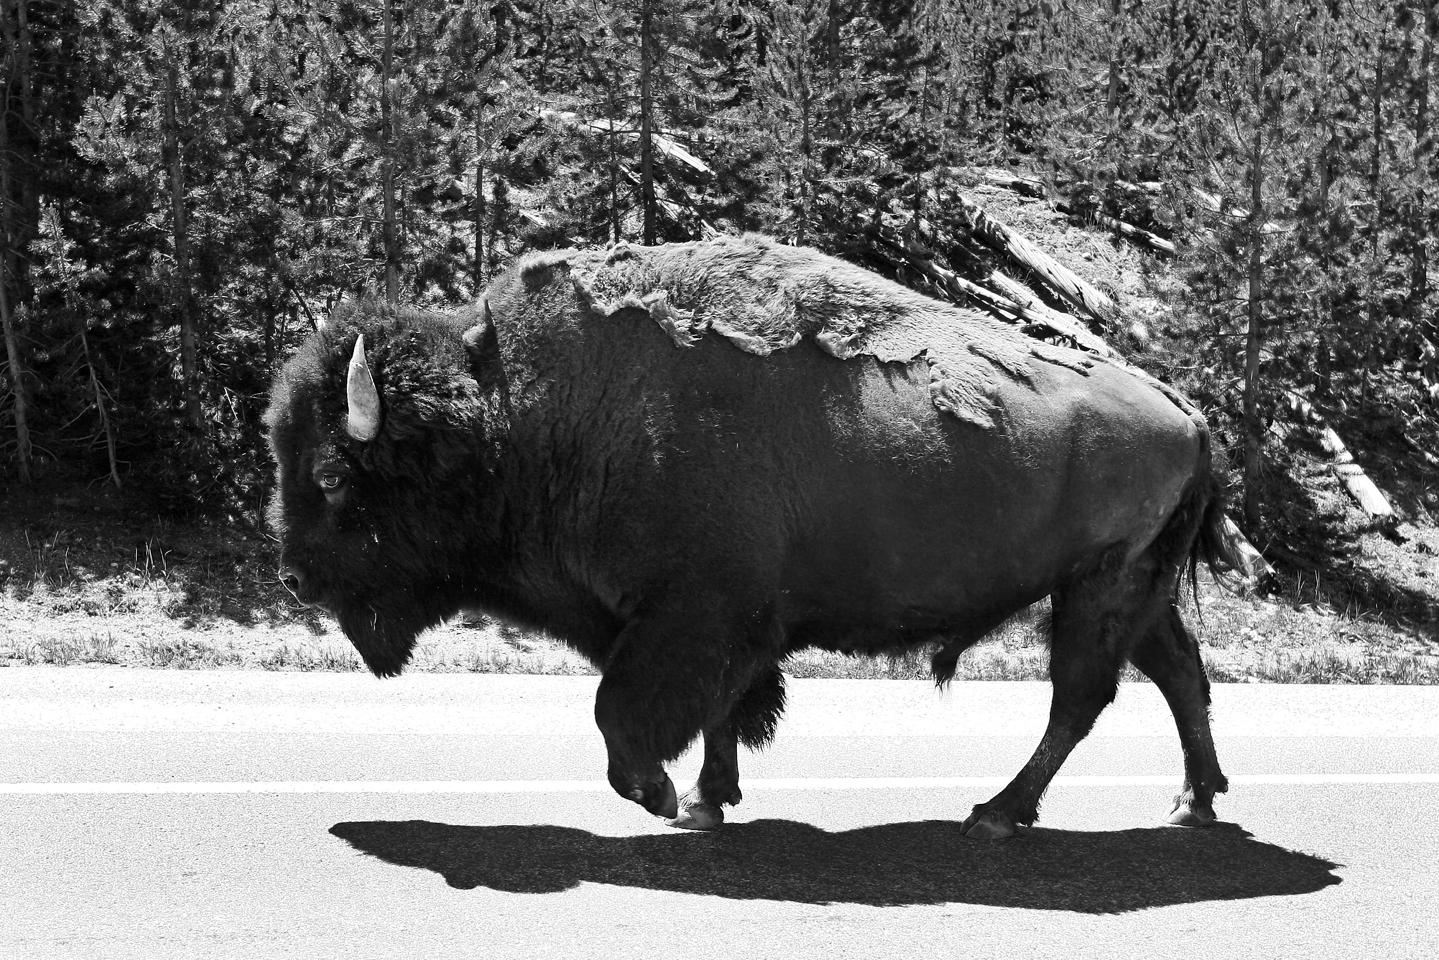 yellowstone-buffalo-walking-road